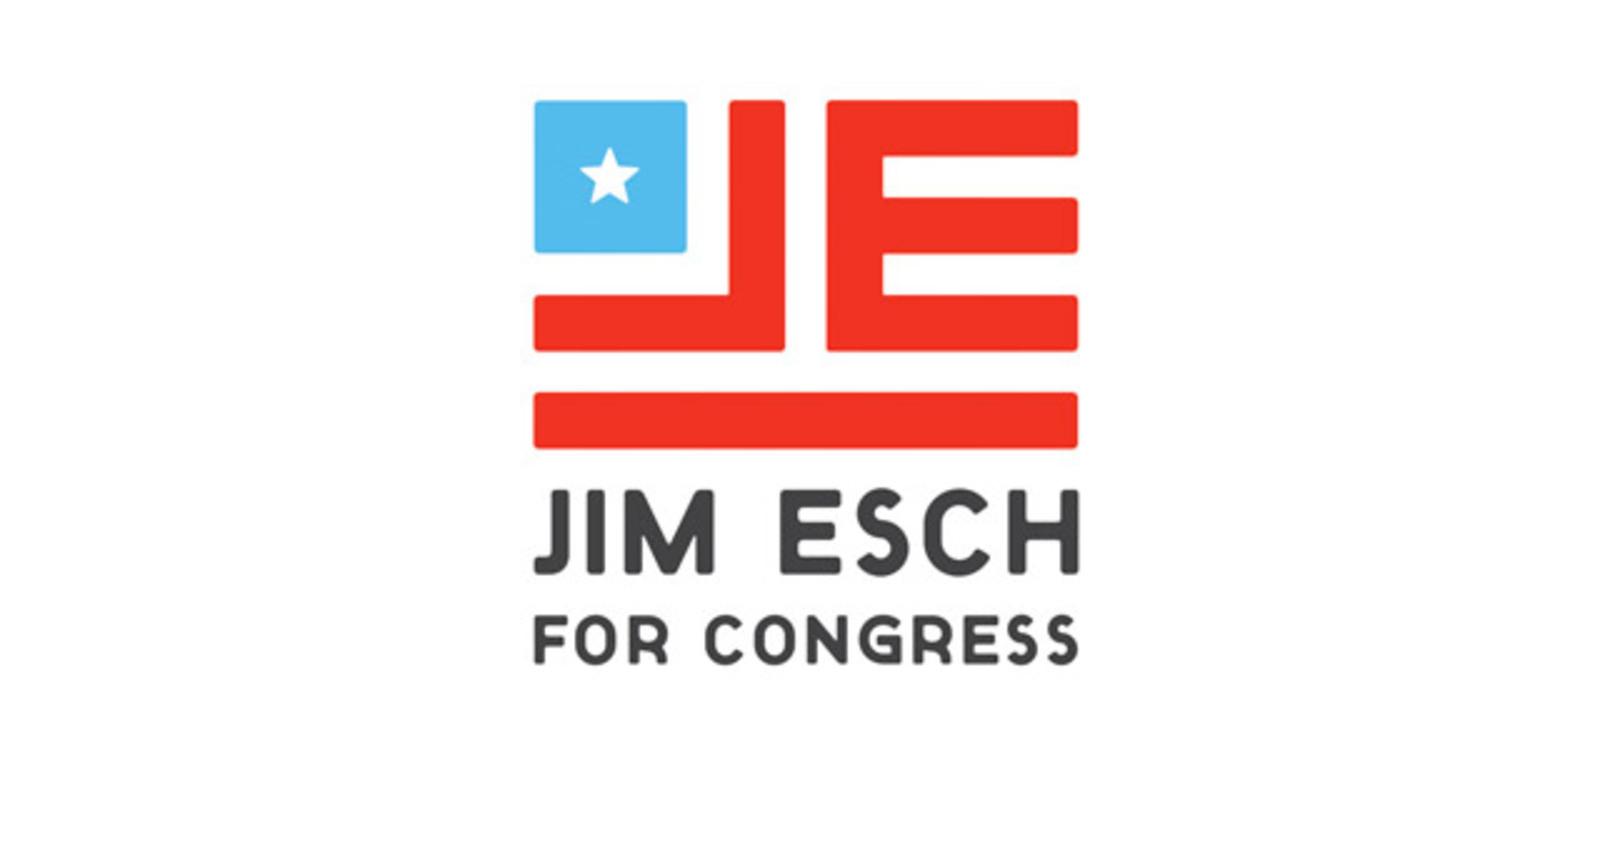 Jim Esch for Congress Logo